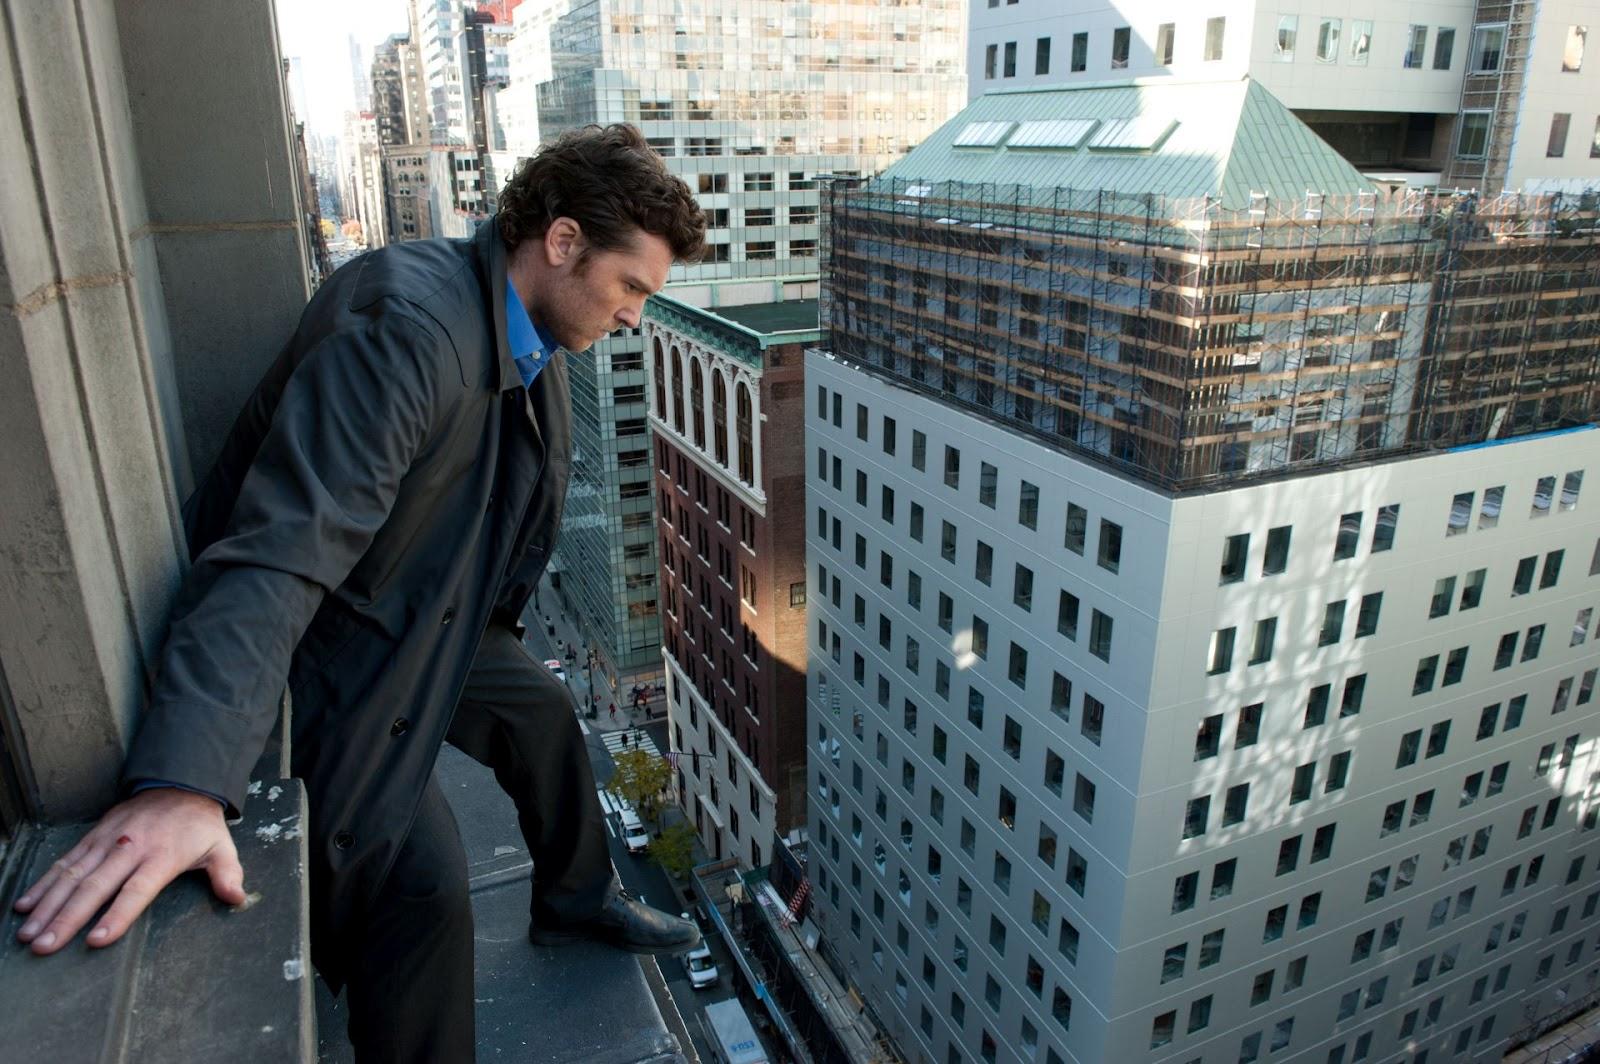 Xem Phim Lối Thoát 2012 - Man On A Ledge